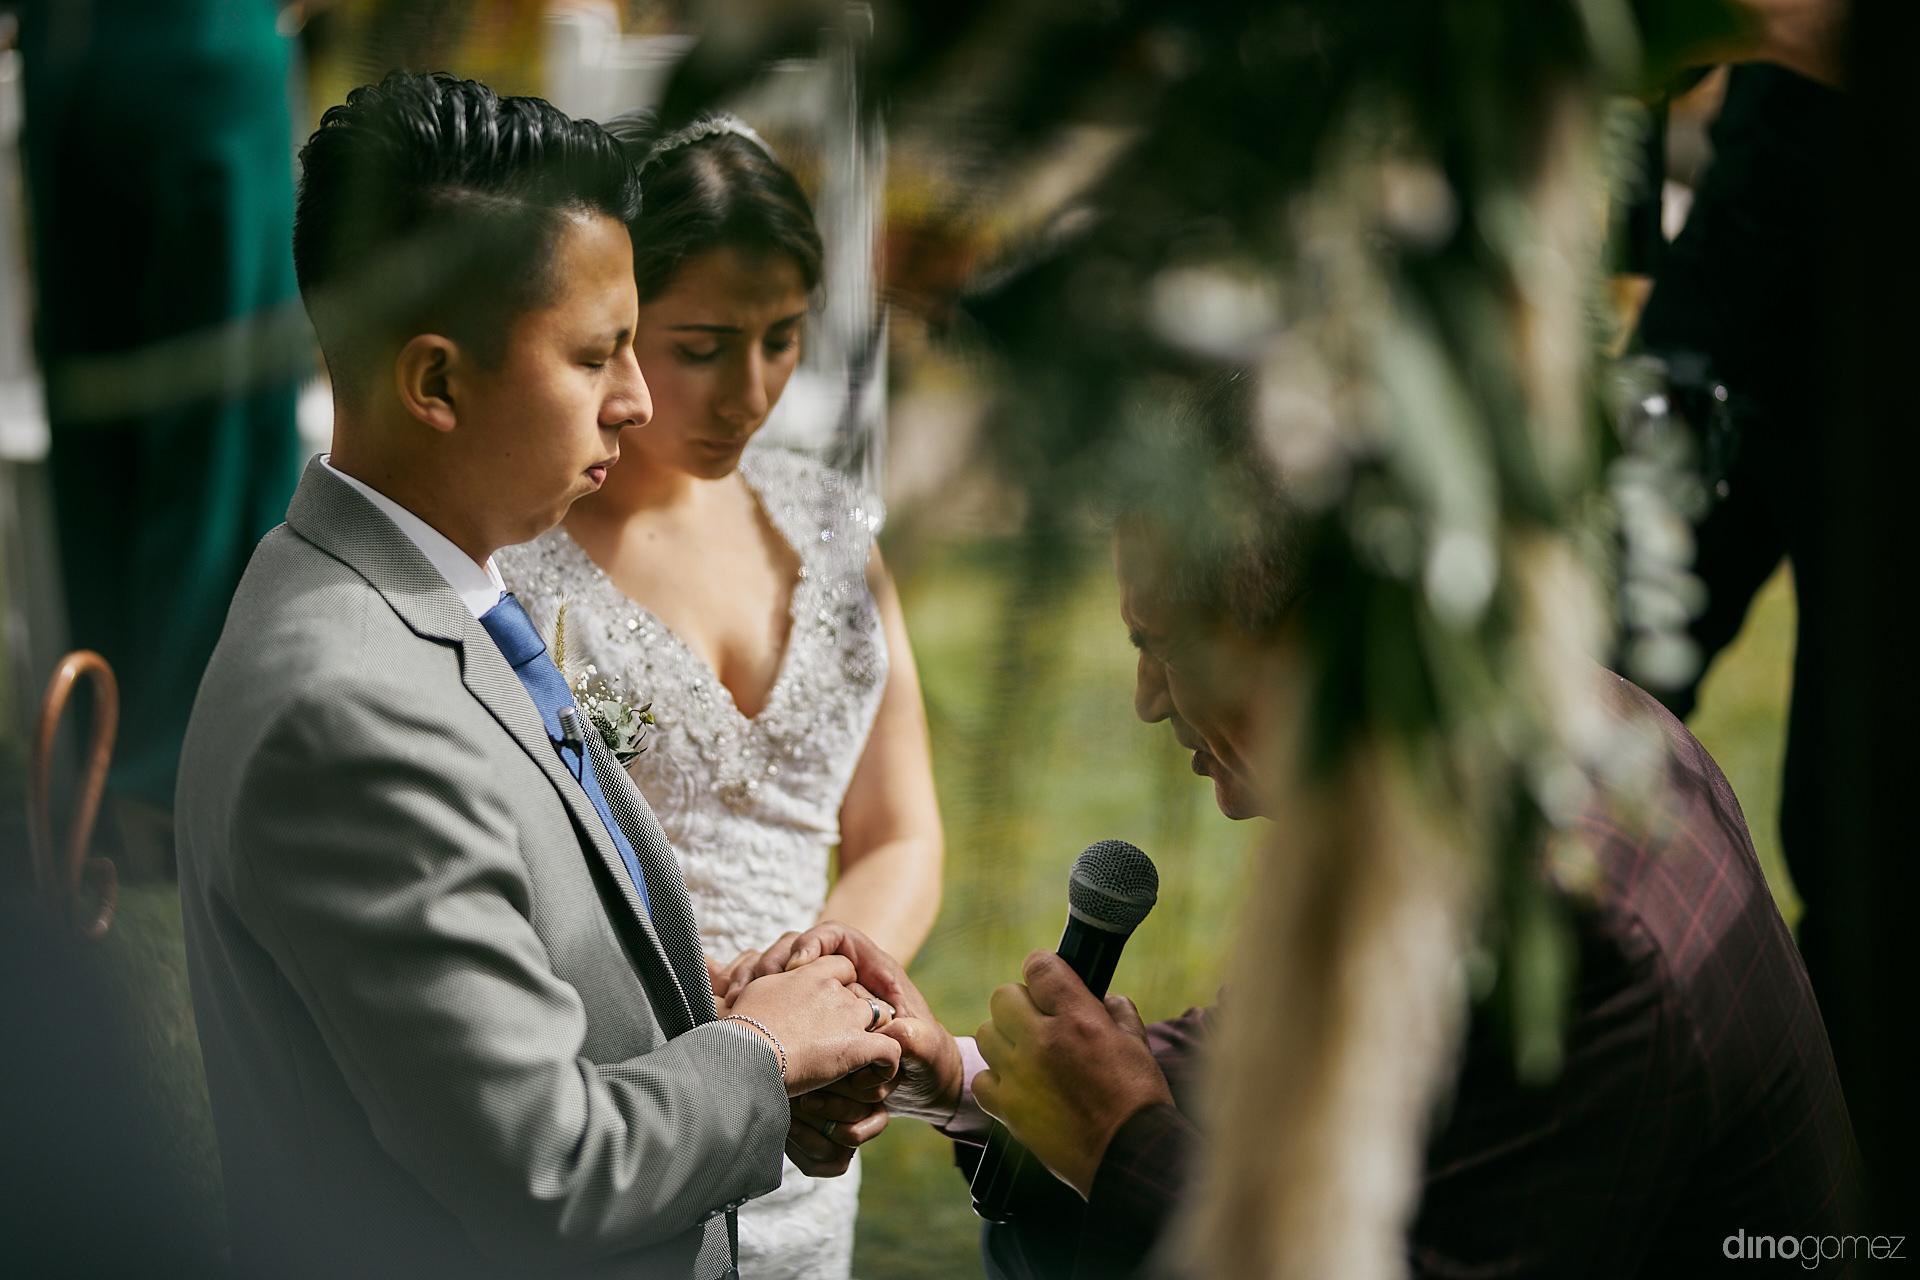 007 - Diy Budget Destination Weddings Can Be Prety Too!